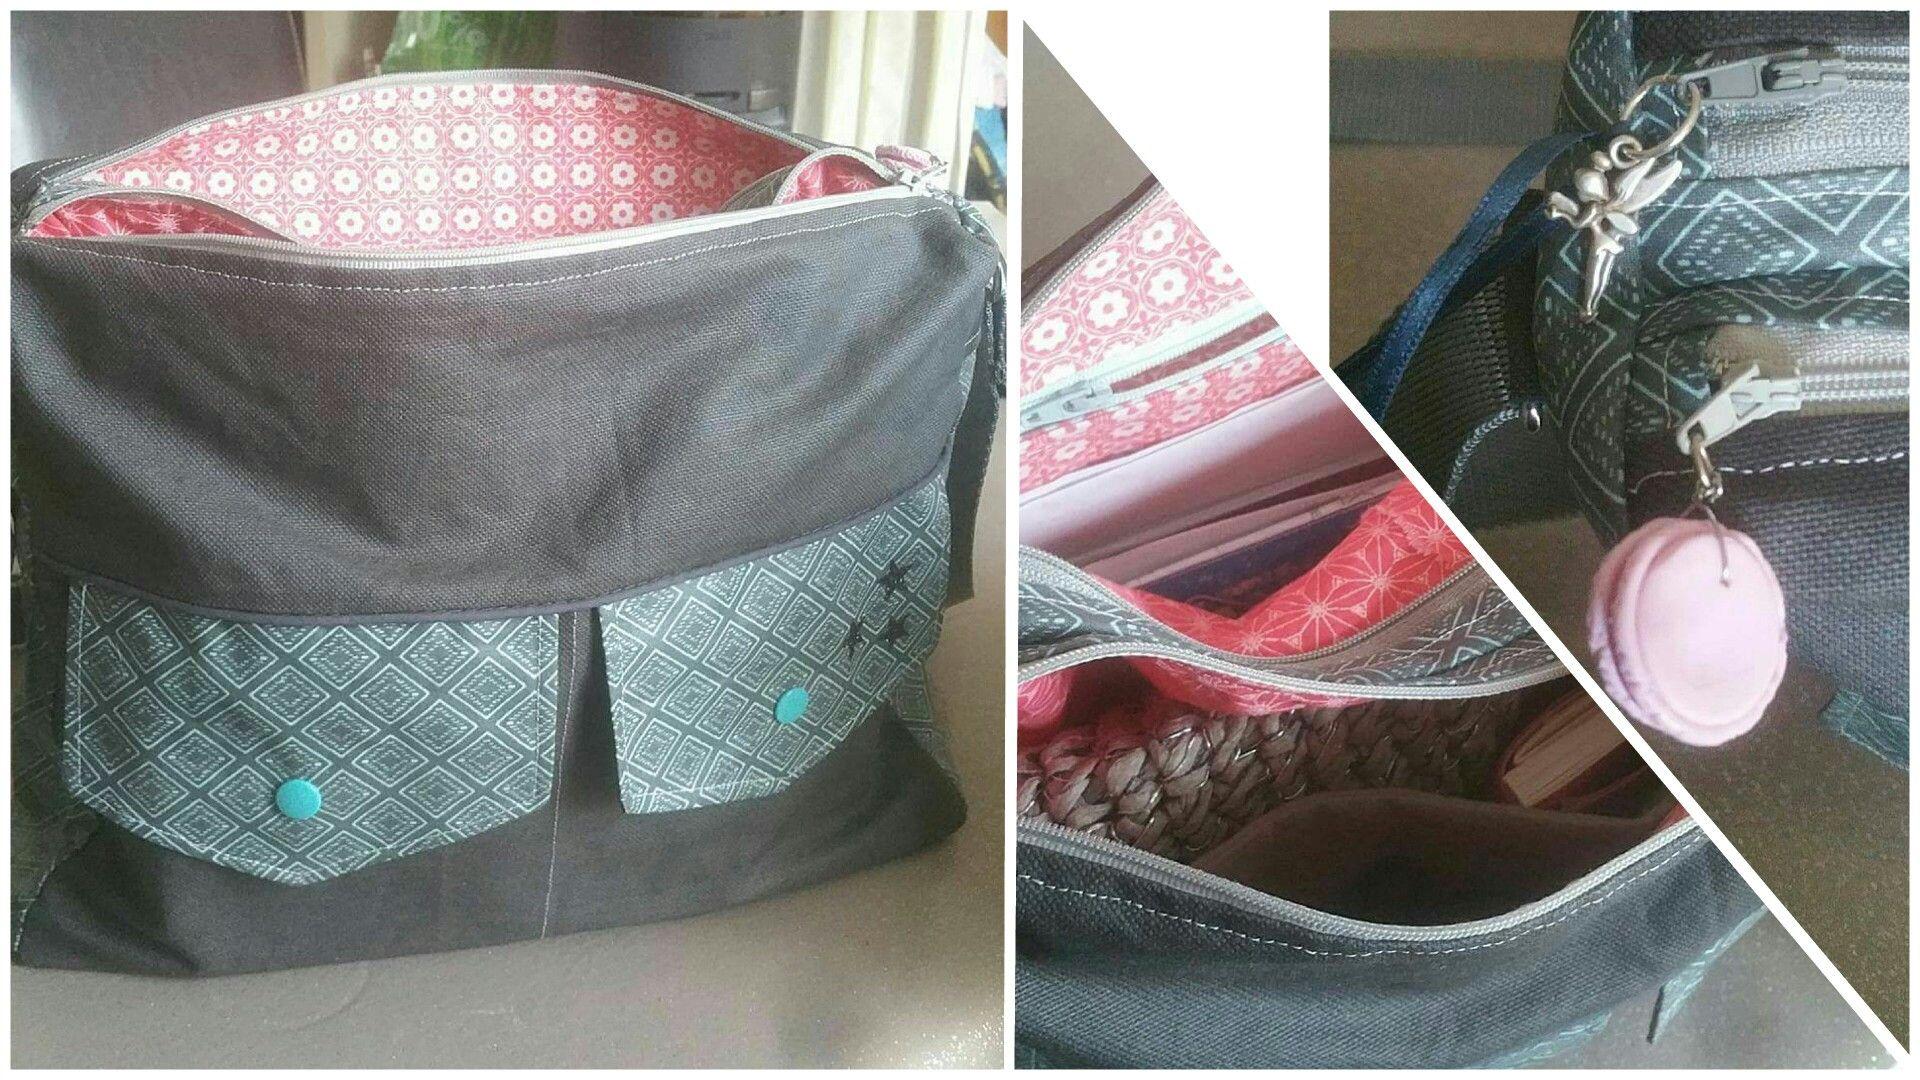 Besace zip-zip cousue par Soasig - Patron de couture Sacôtin